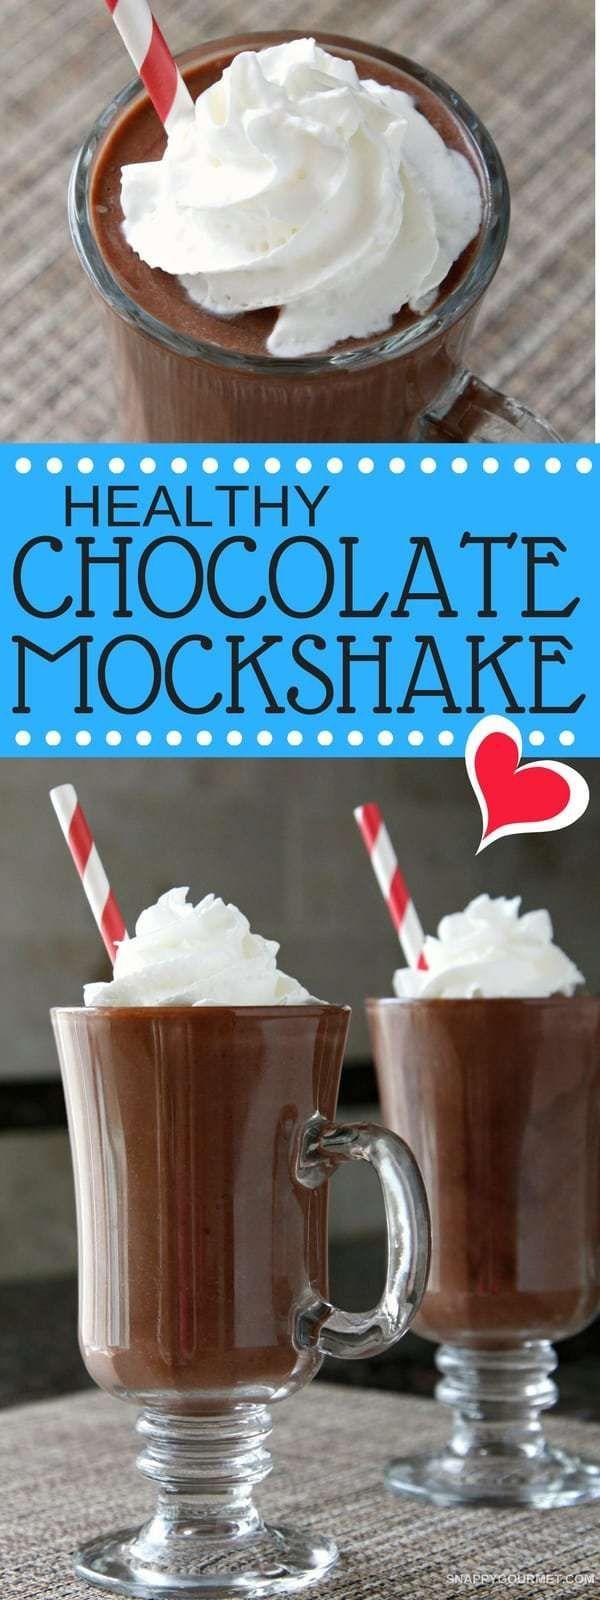 Healthy Chocolate Mockshake - easy healthy chocolate milkshake recipe without milk or ice cream! SnappyGourmet.com #Healthy #Chocolate #Milkshake #SnappyGourmet #Recipe